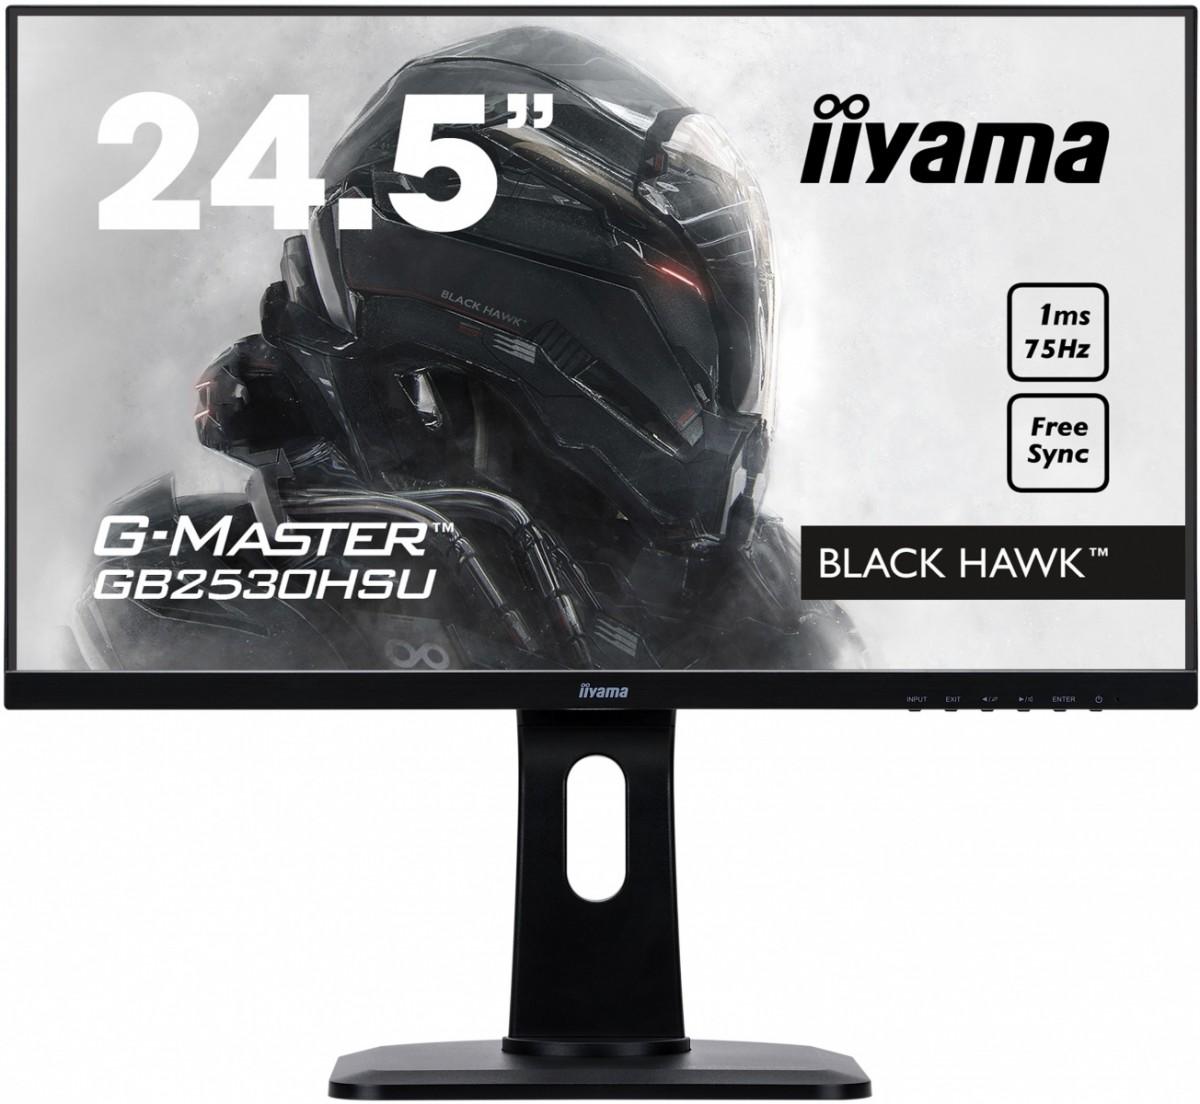 monitor-245-gb2530hsu-b1-1mshdmidpusbpivot-freesyncflicker